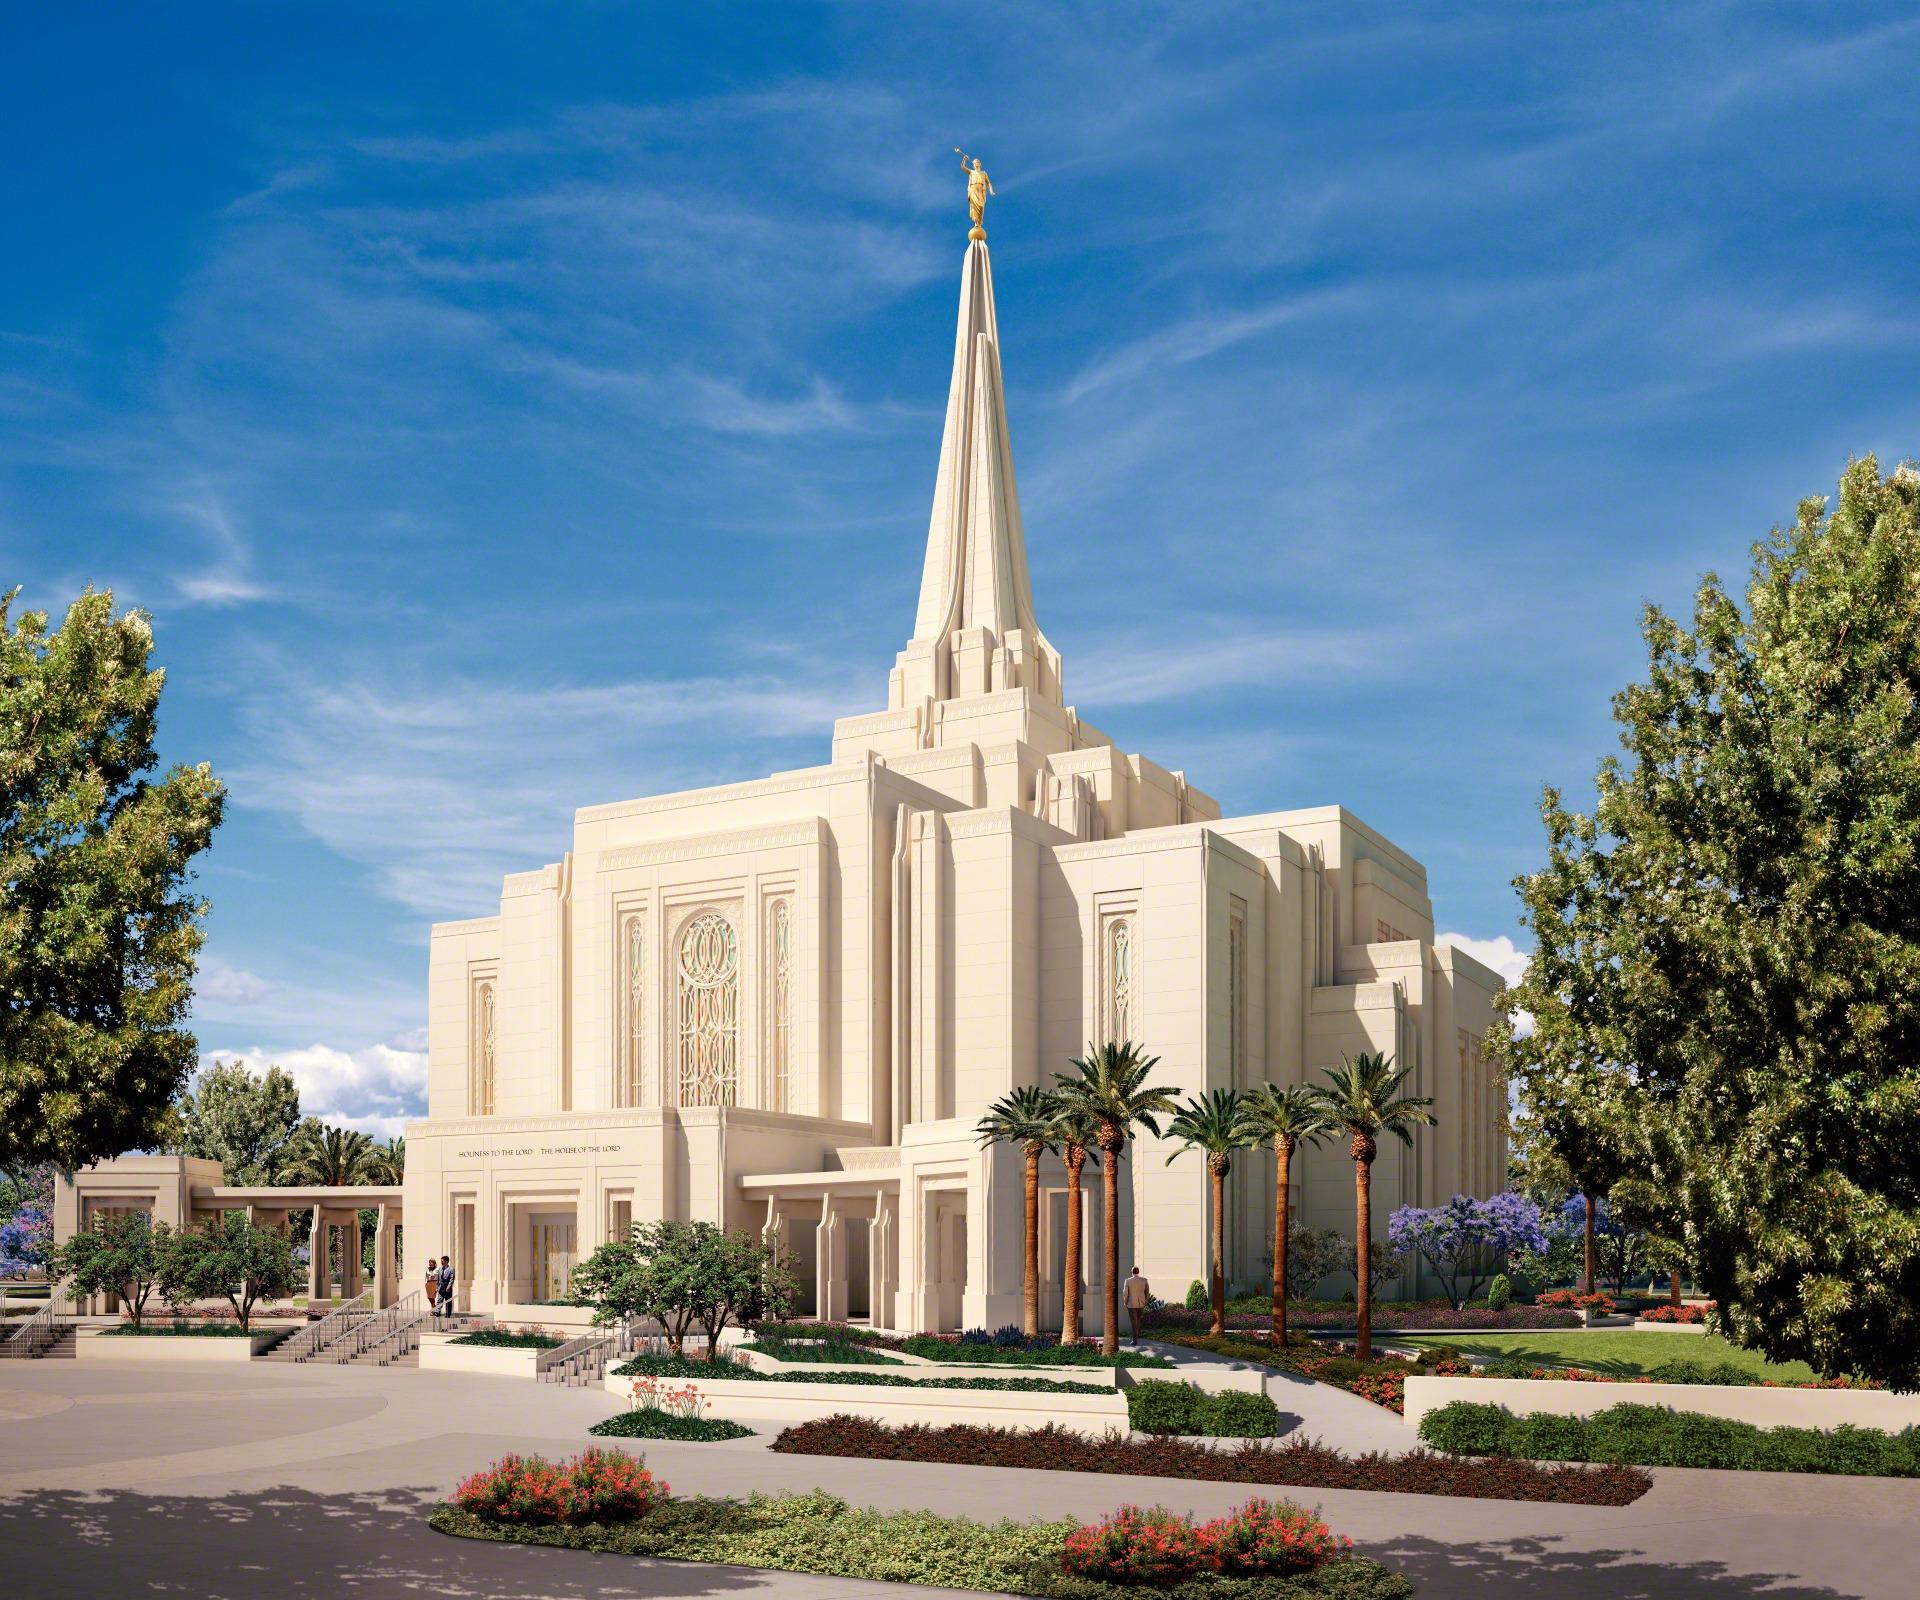 The Gilbert Arizona Temple